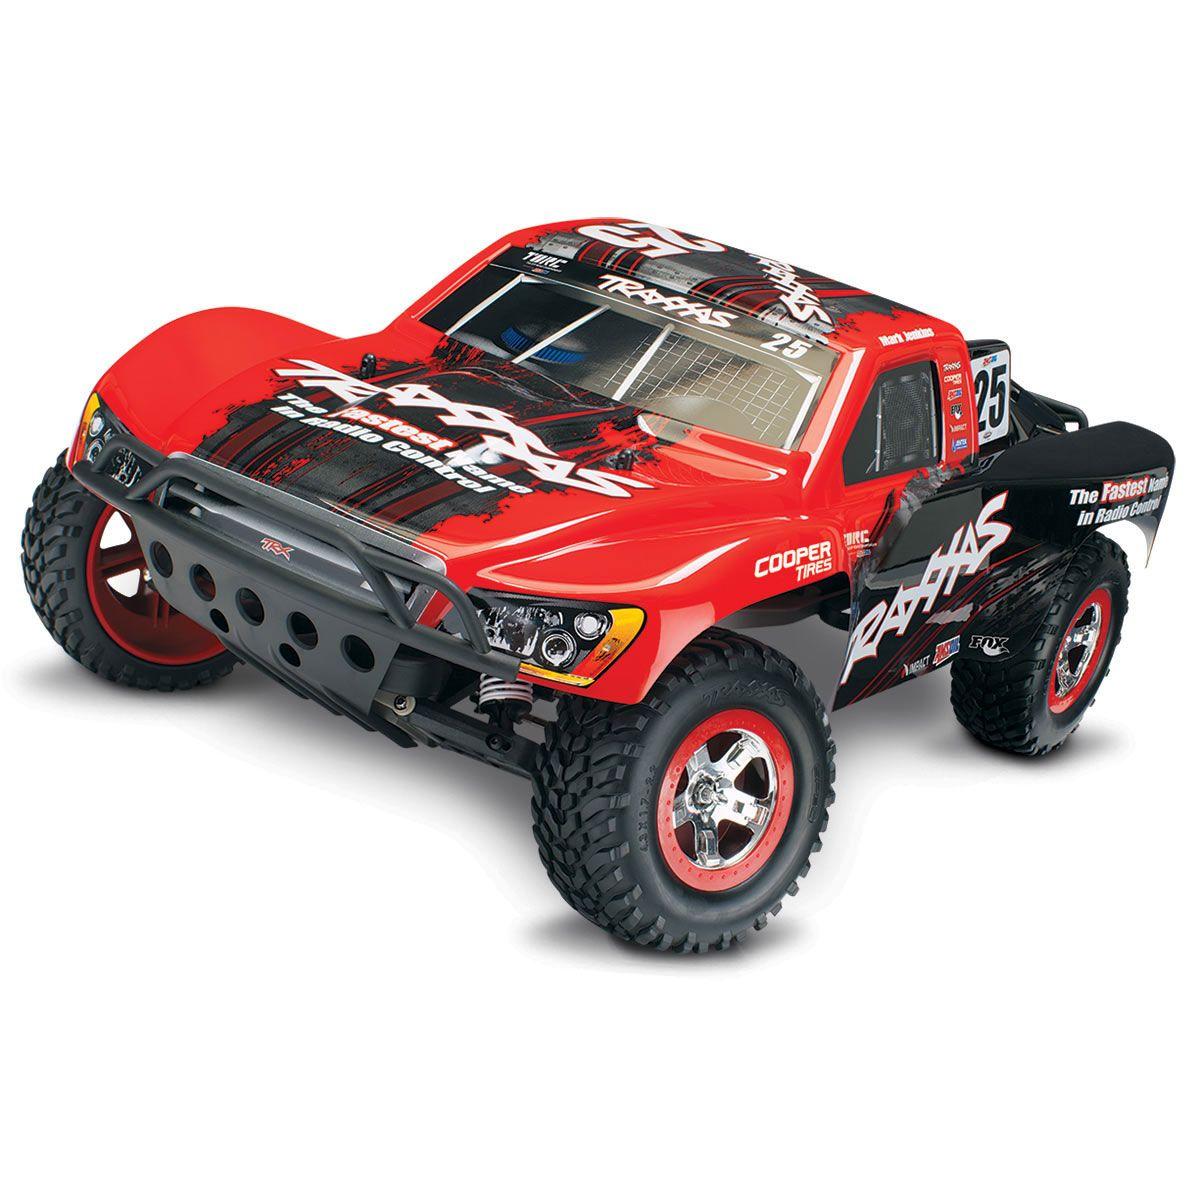 traxxas 1 10 slash 2 wheel drive ready to run model rc stadium truck rh horizonhobby com Traxxas T-Maxx 2.5 Diagram Traxxas Revo 3 3 Diagram